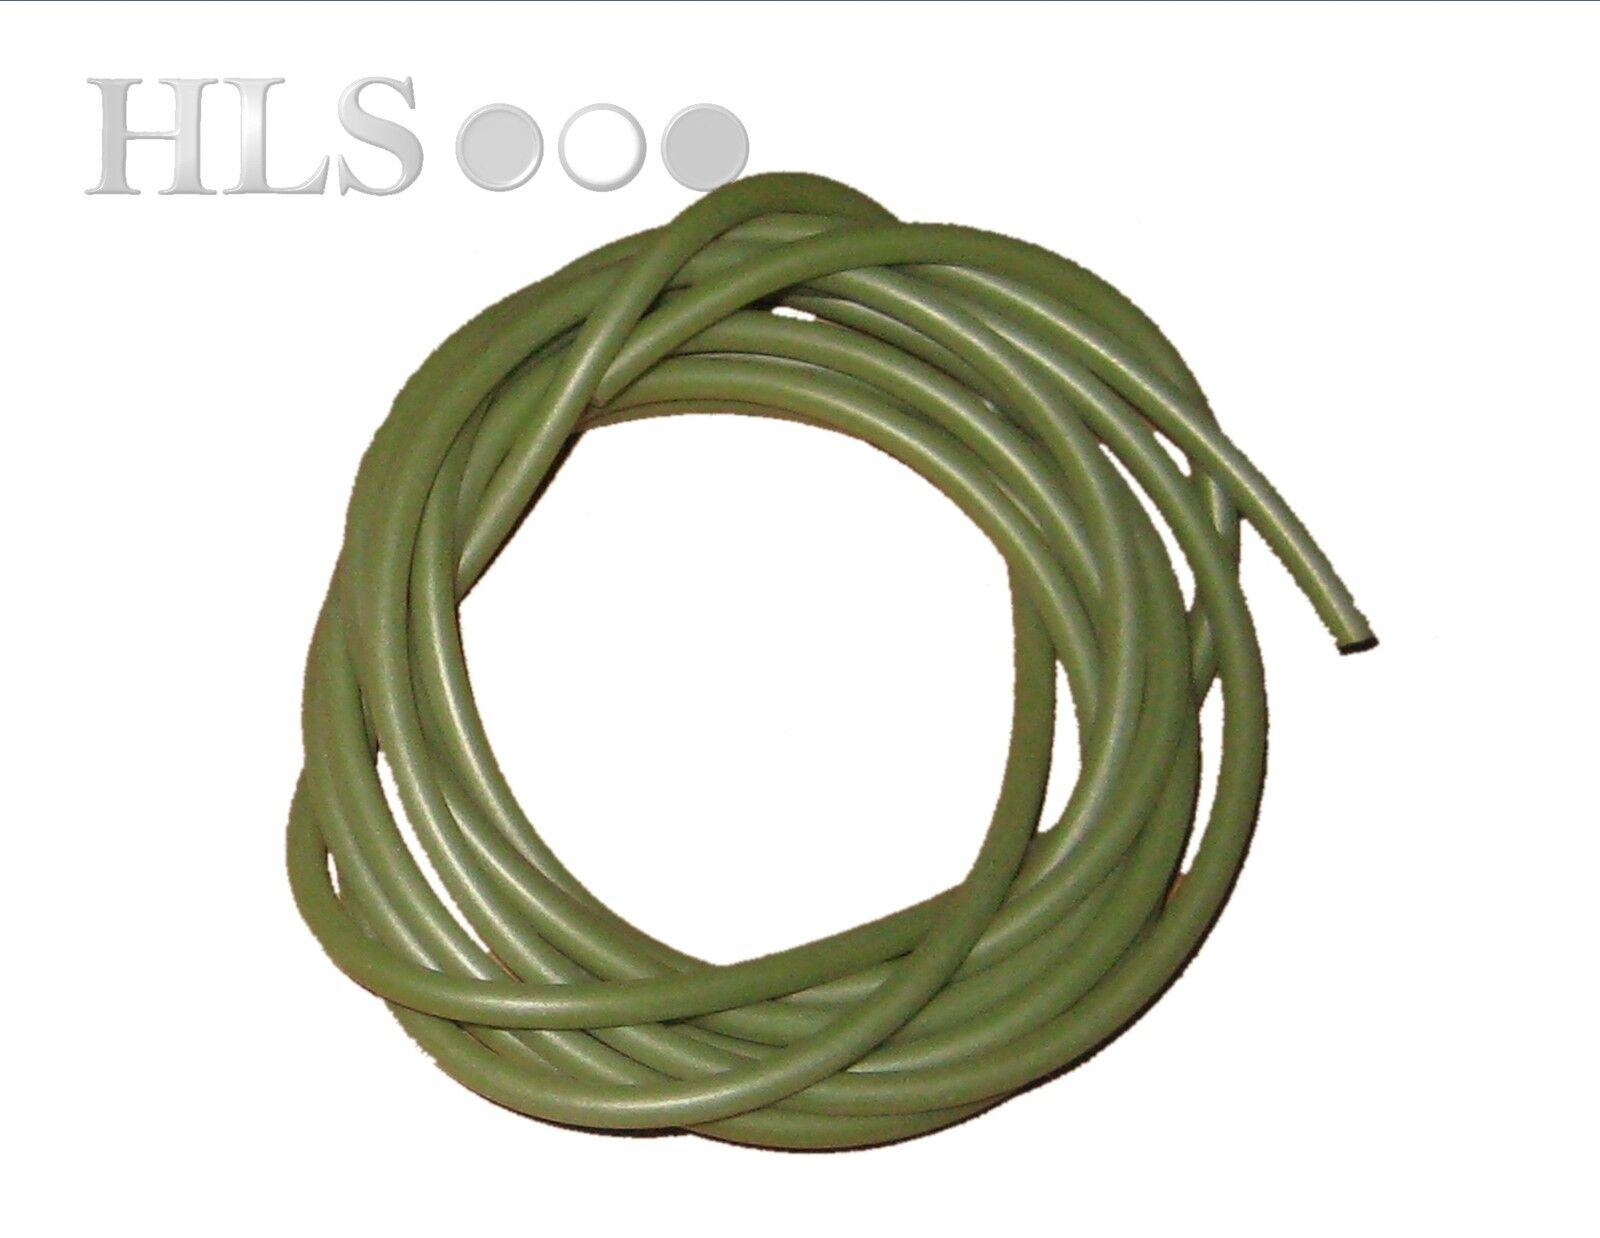 green Silikon Rig  Tube 0.5 - 5.0mm Id Lebensmittelecht Hohe Temp -  factory direct sales